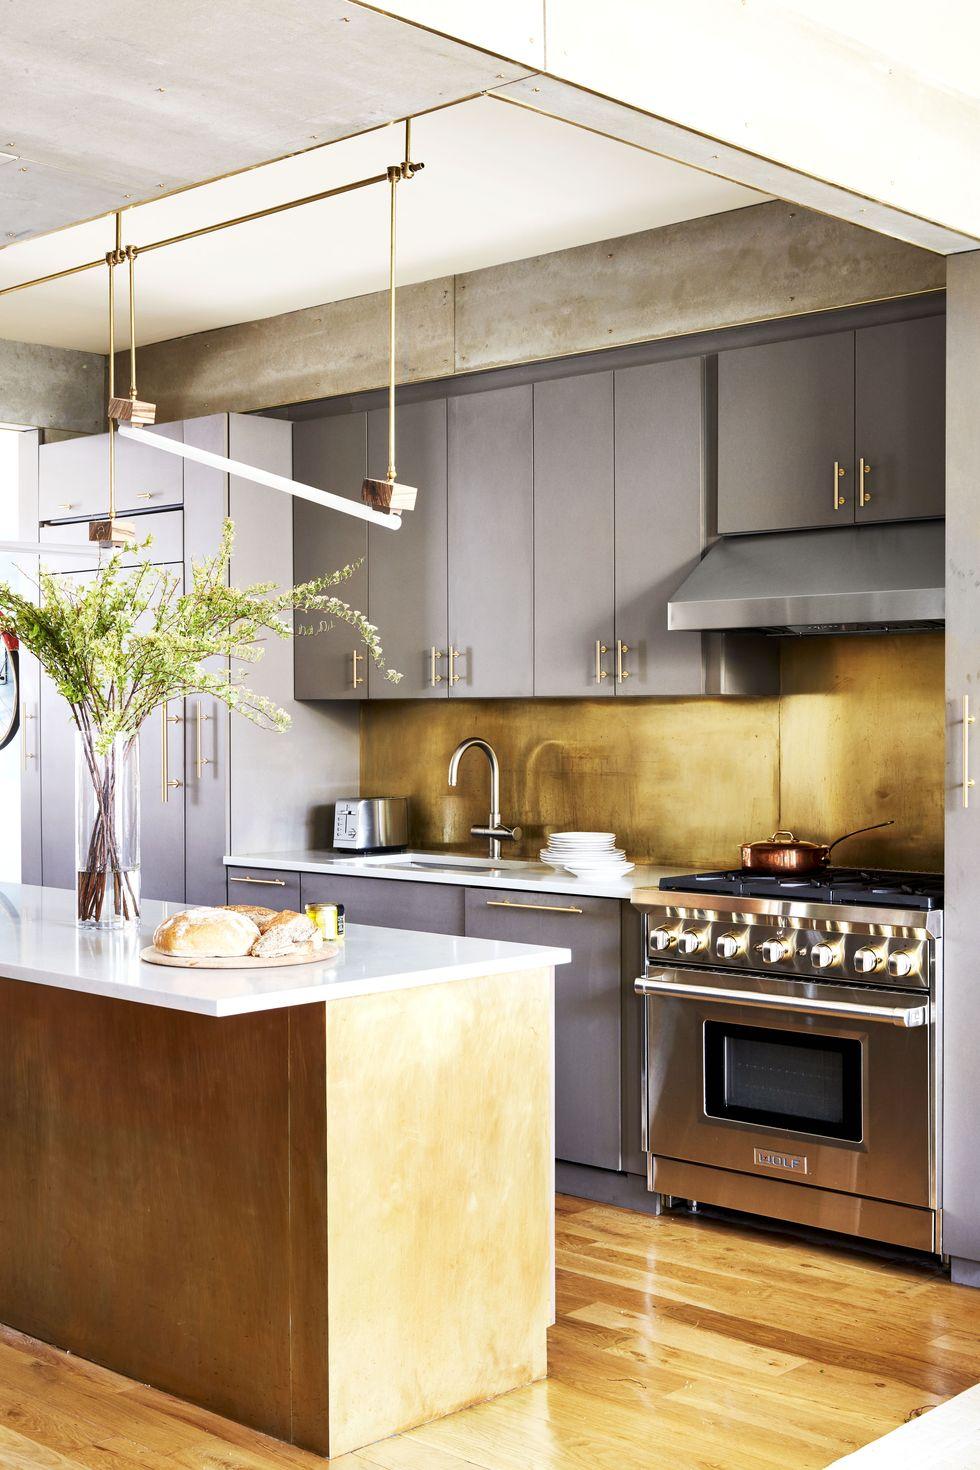 Kitchen Trends 2020 - Designers Share Their Favorite ...